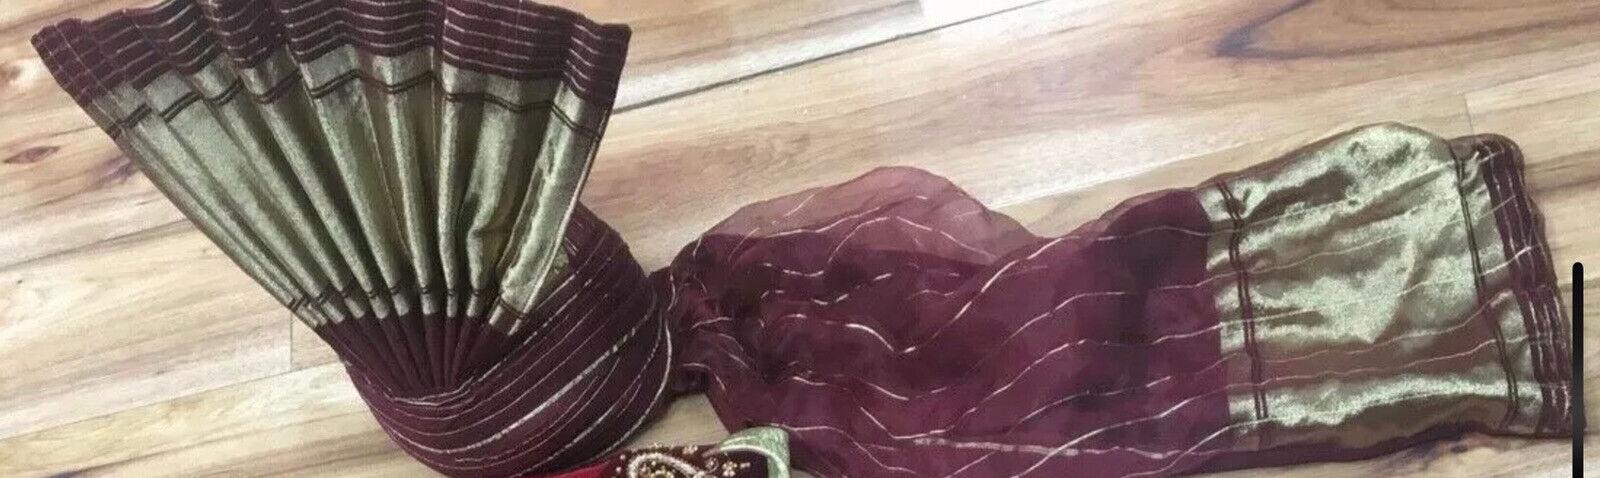 Asian Groom Wedding Turban (Qulla) - Brand New Flexible Size